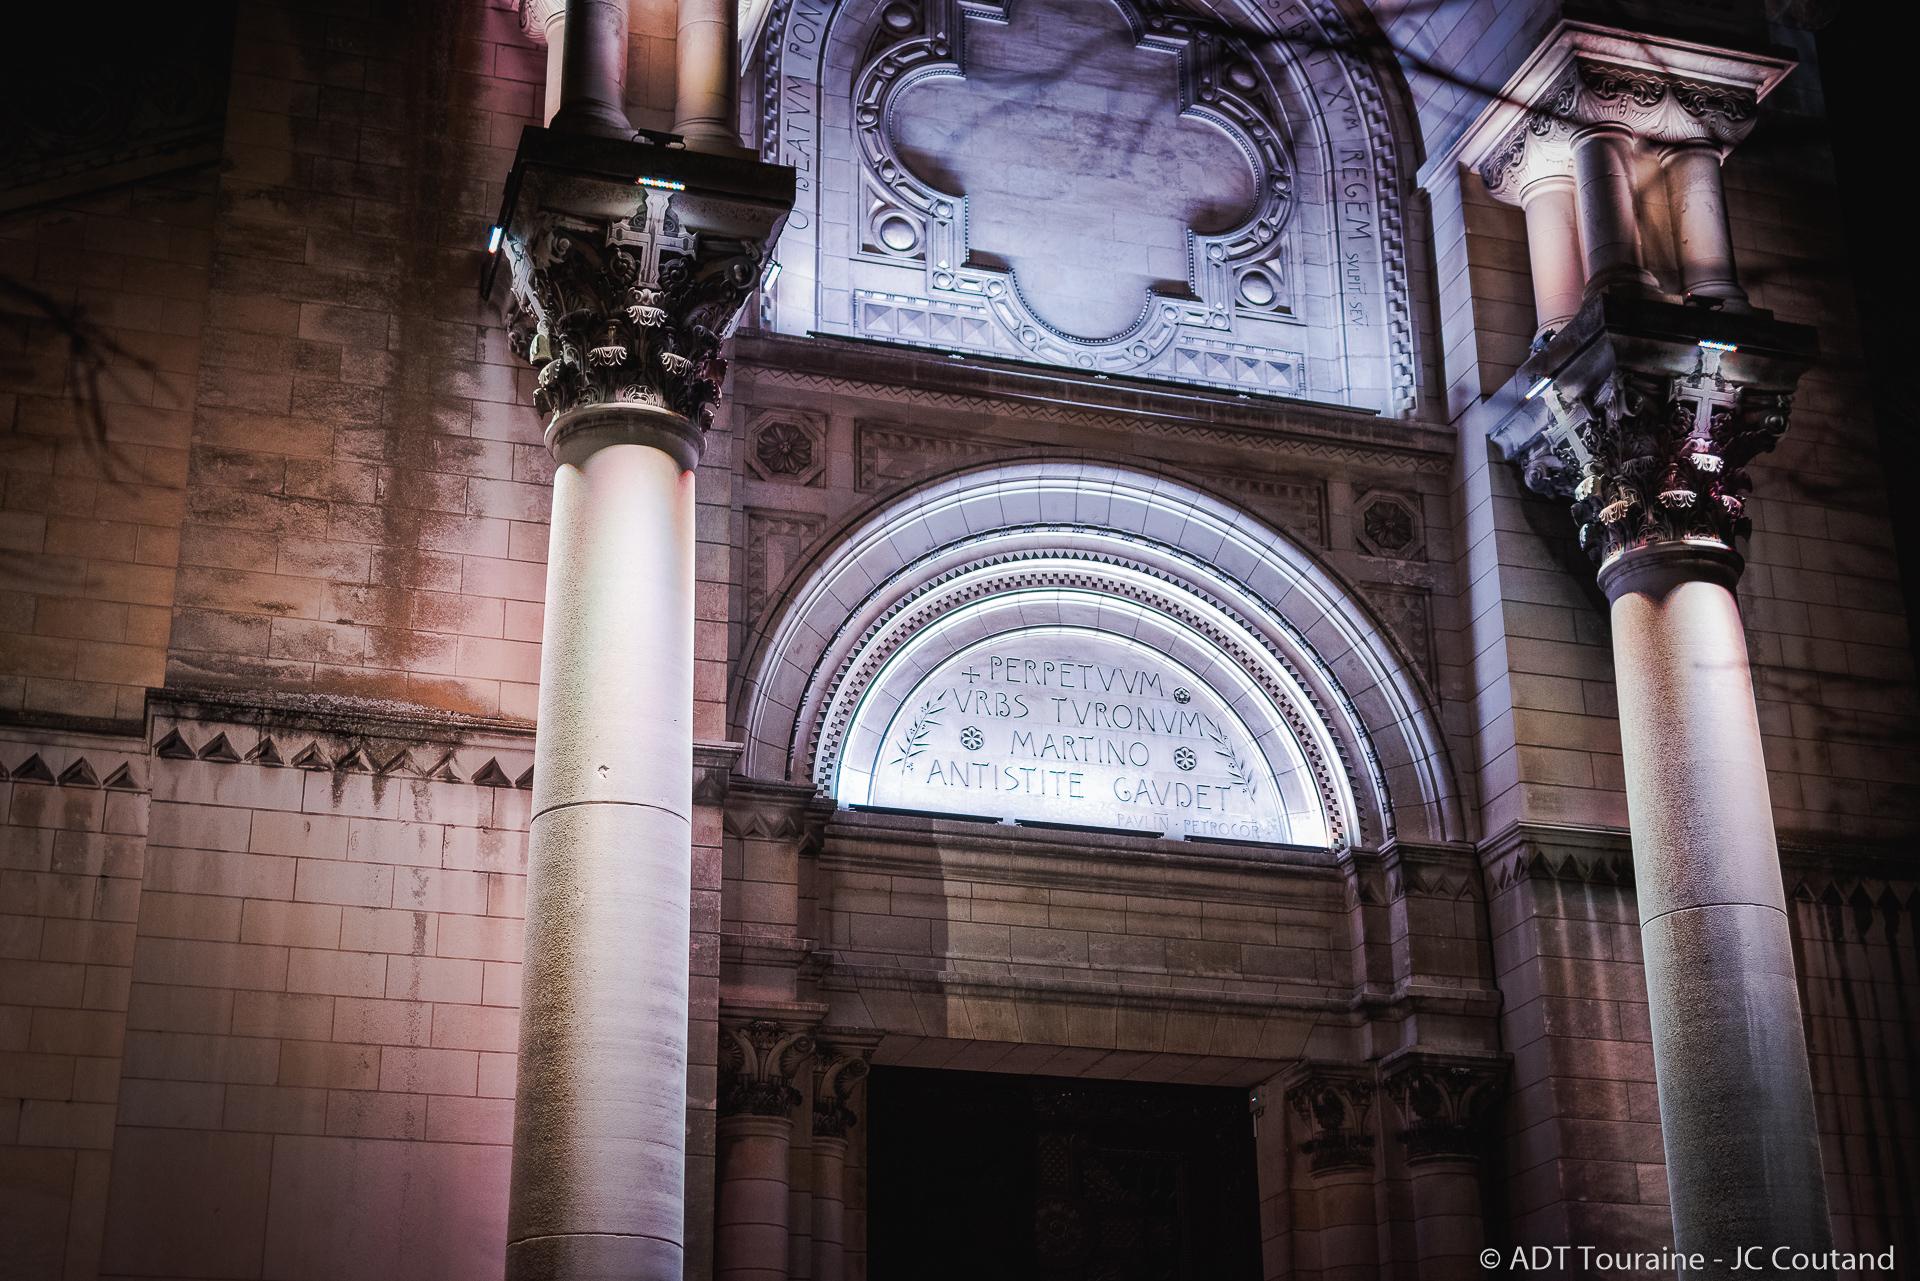 The Basilic of Saint-Martin de Tours